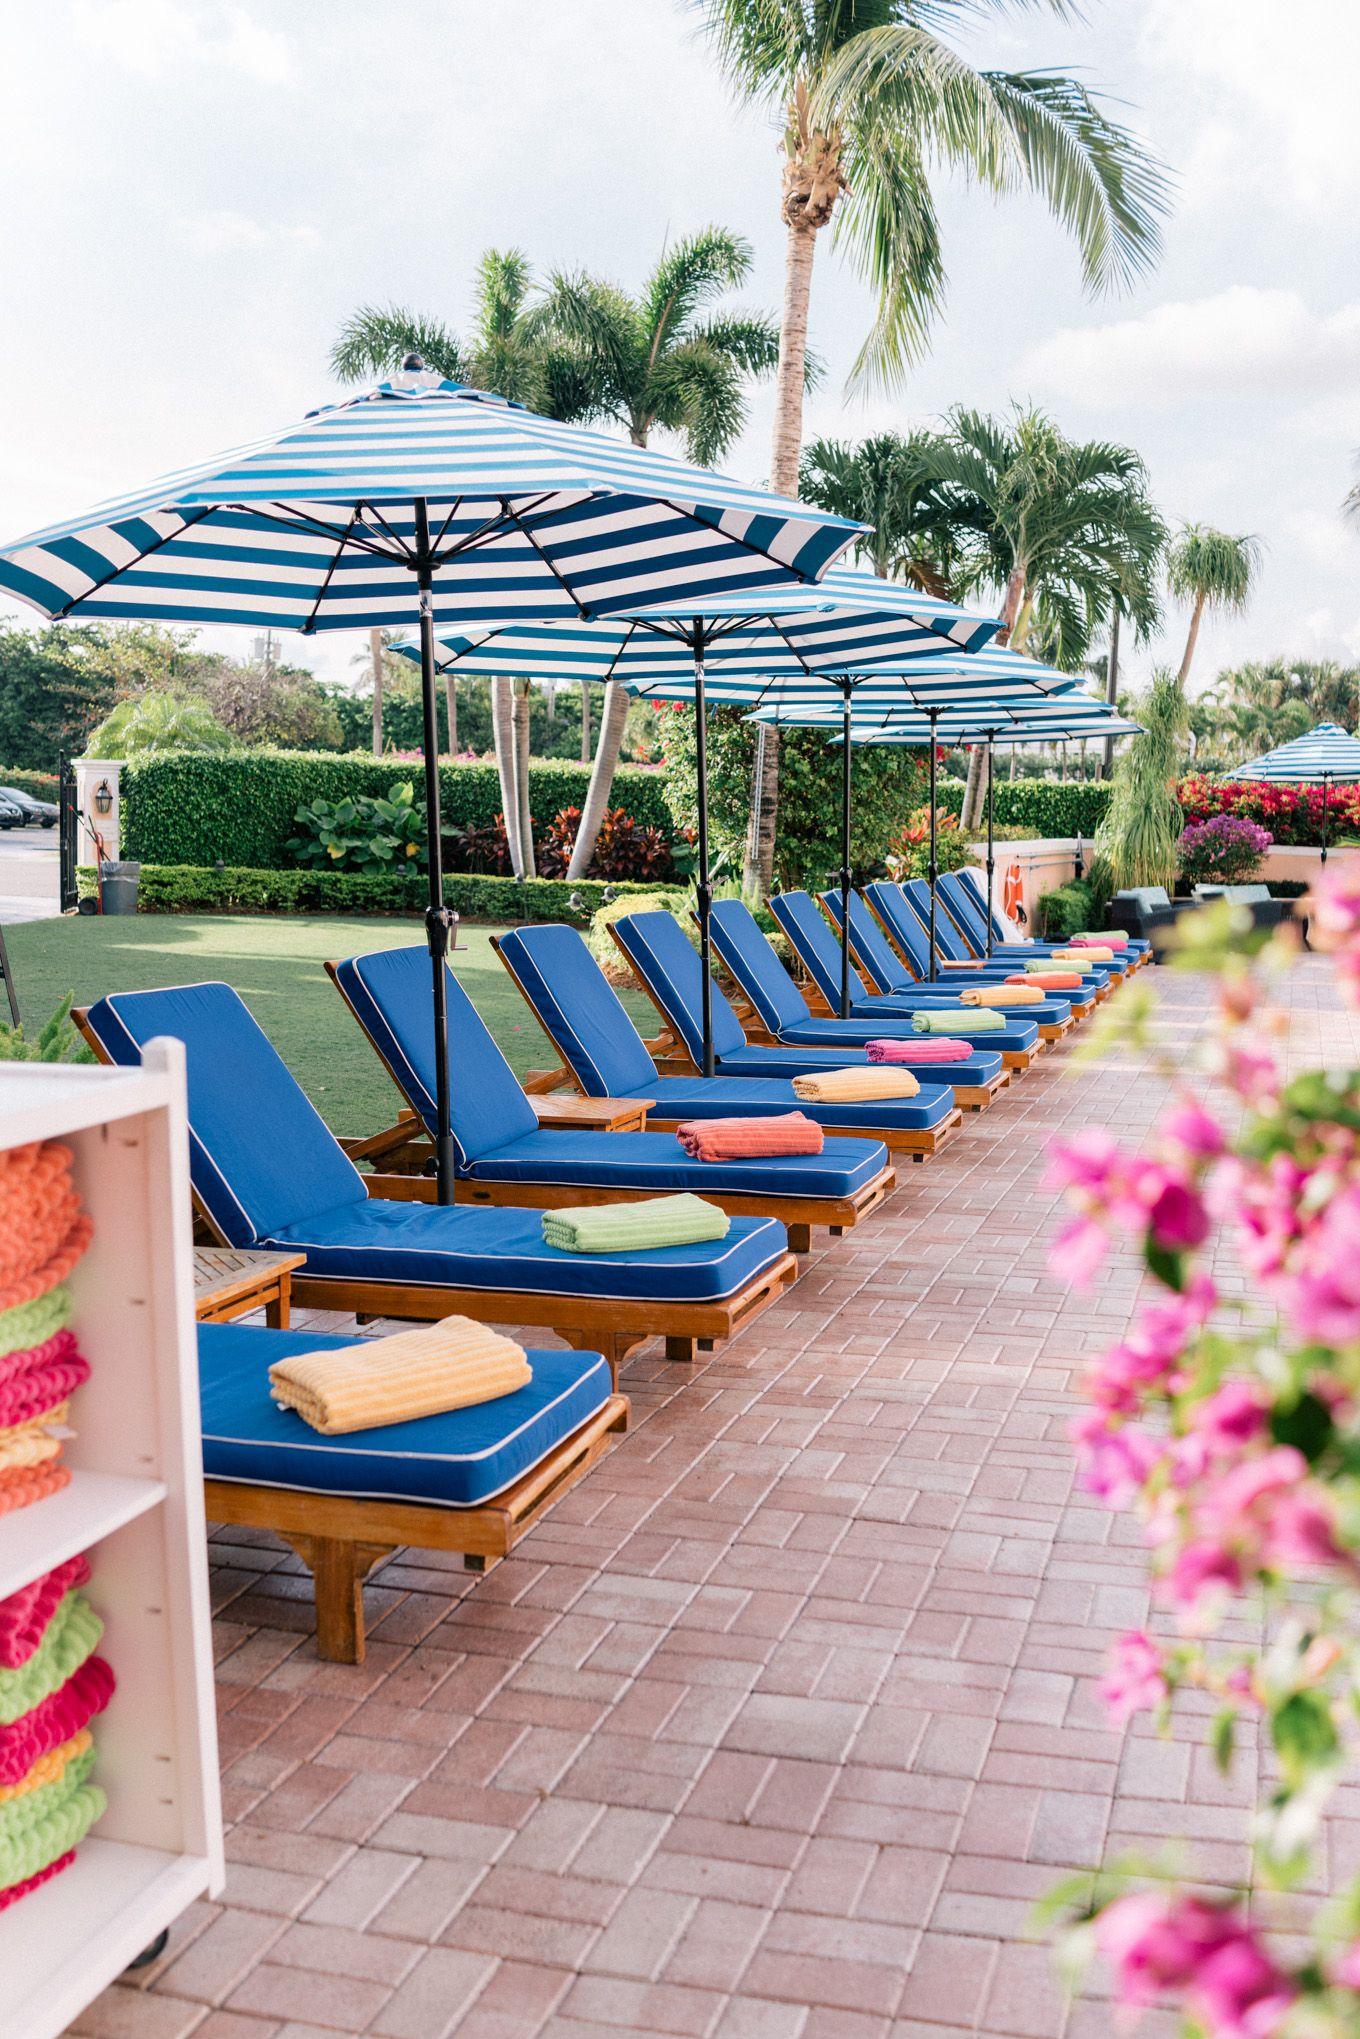 d8d1f7d1f692088a9bf7ea03d31f88d4 - Breakfast Places In Palm Beach Gardens